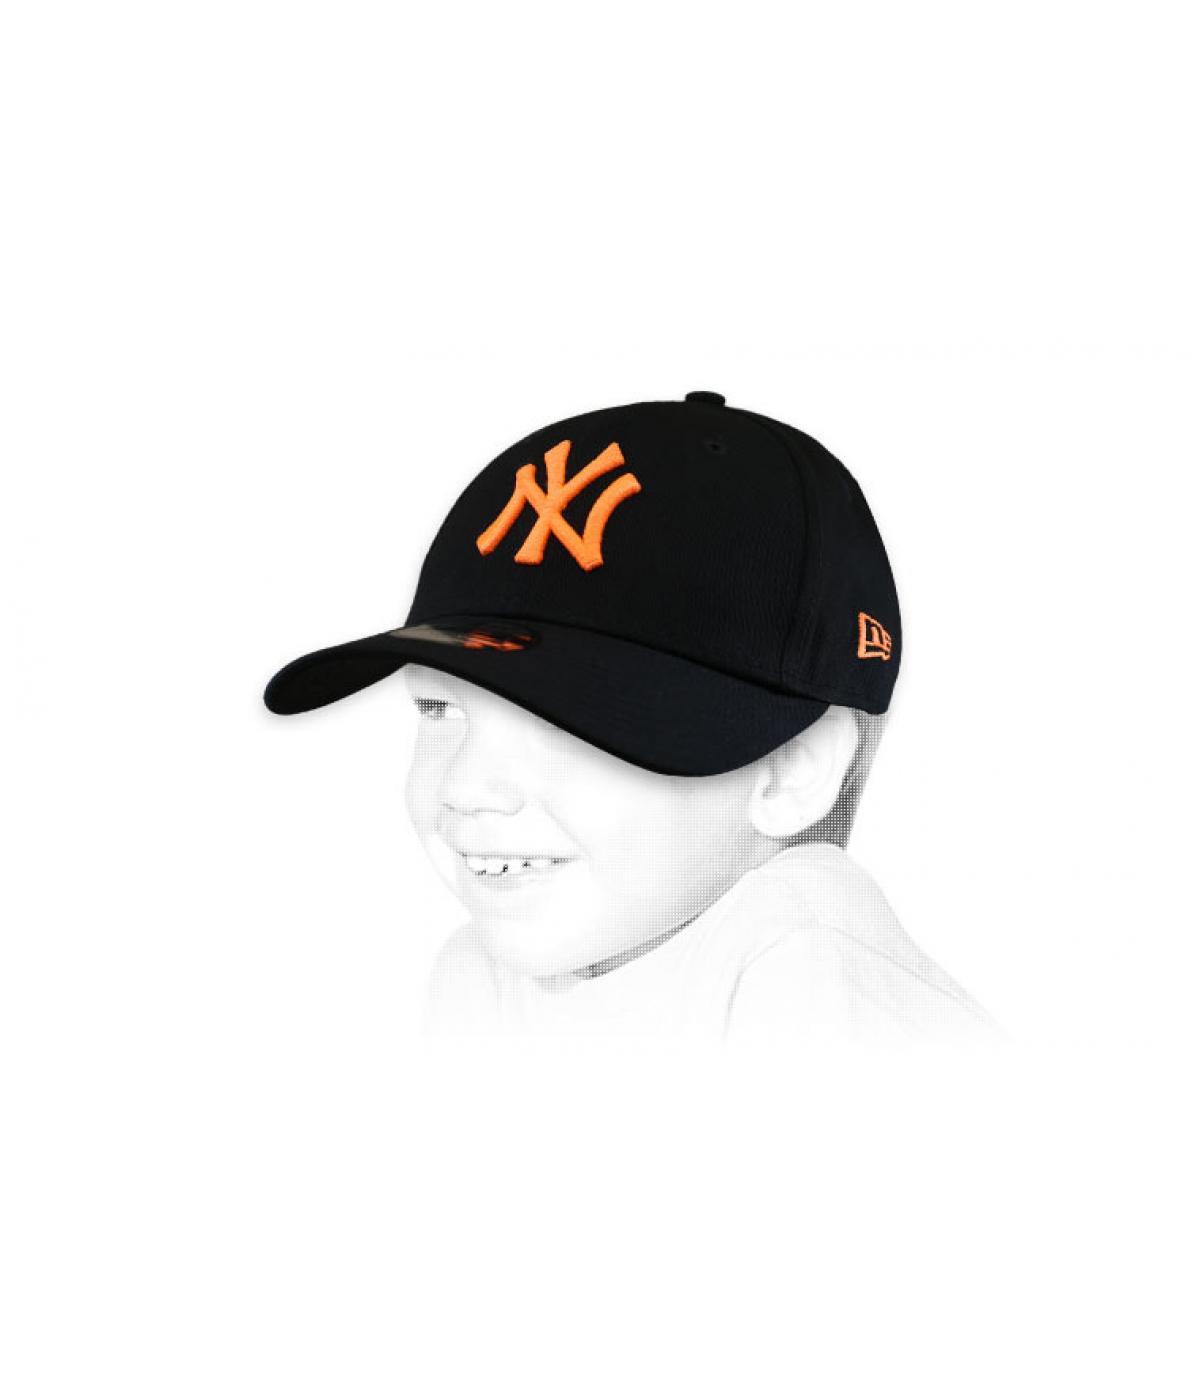 casquette NY enfant schwarz orange